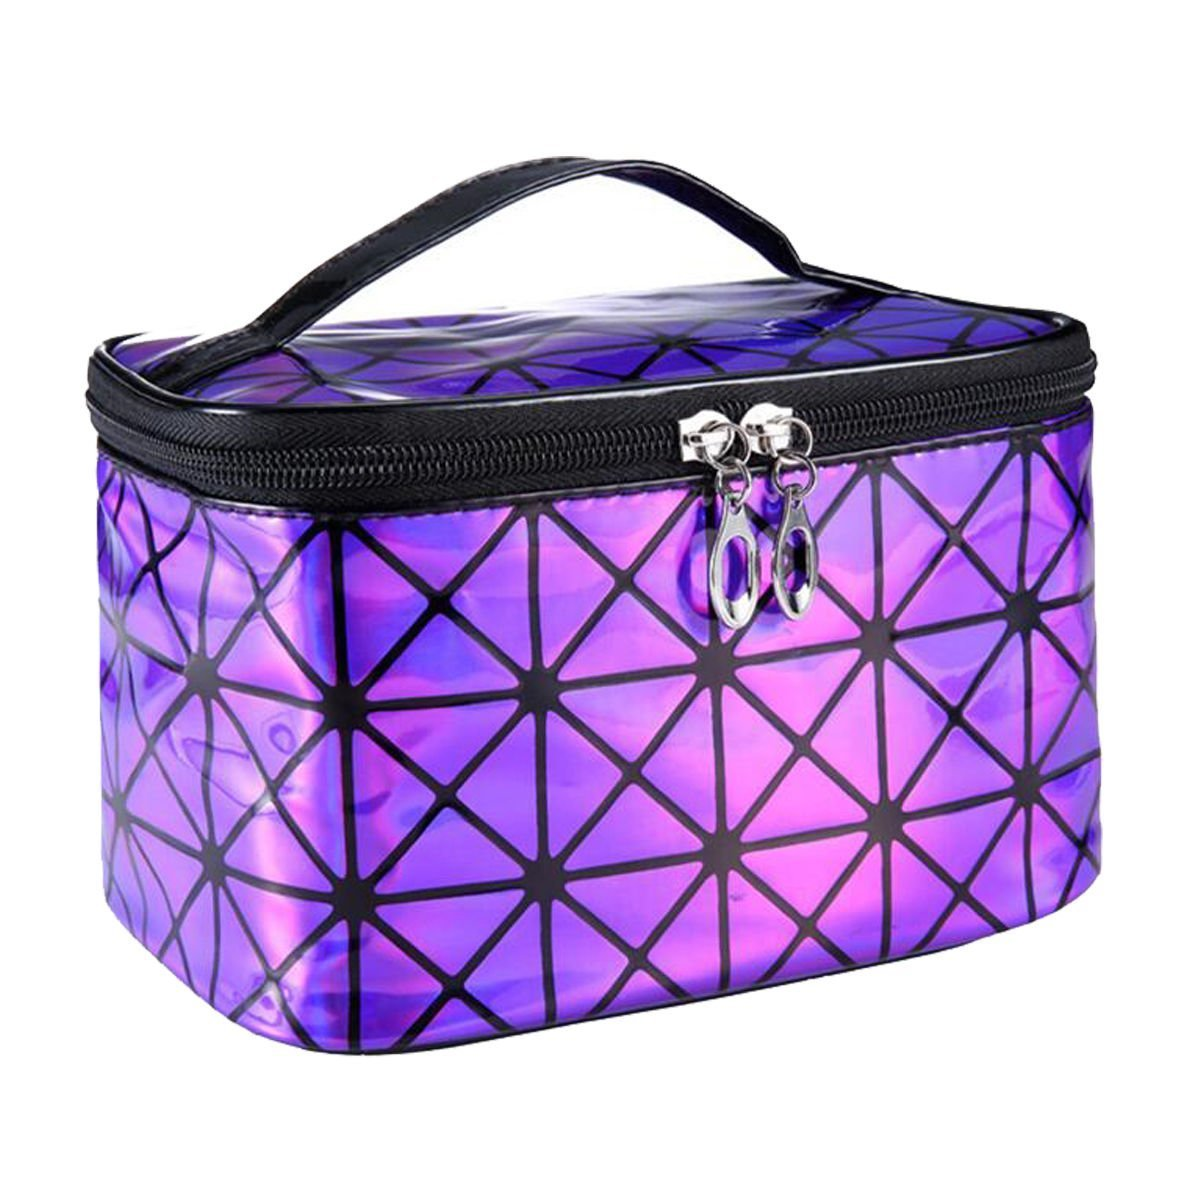 Women Portable Travel Cosmetic Bag Makeup Bag Waterproof PU Leather Handy Toiletry Bag Purple